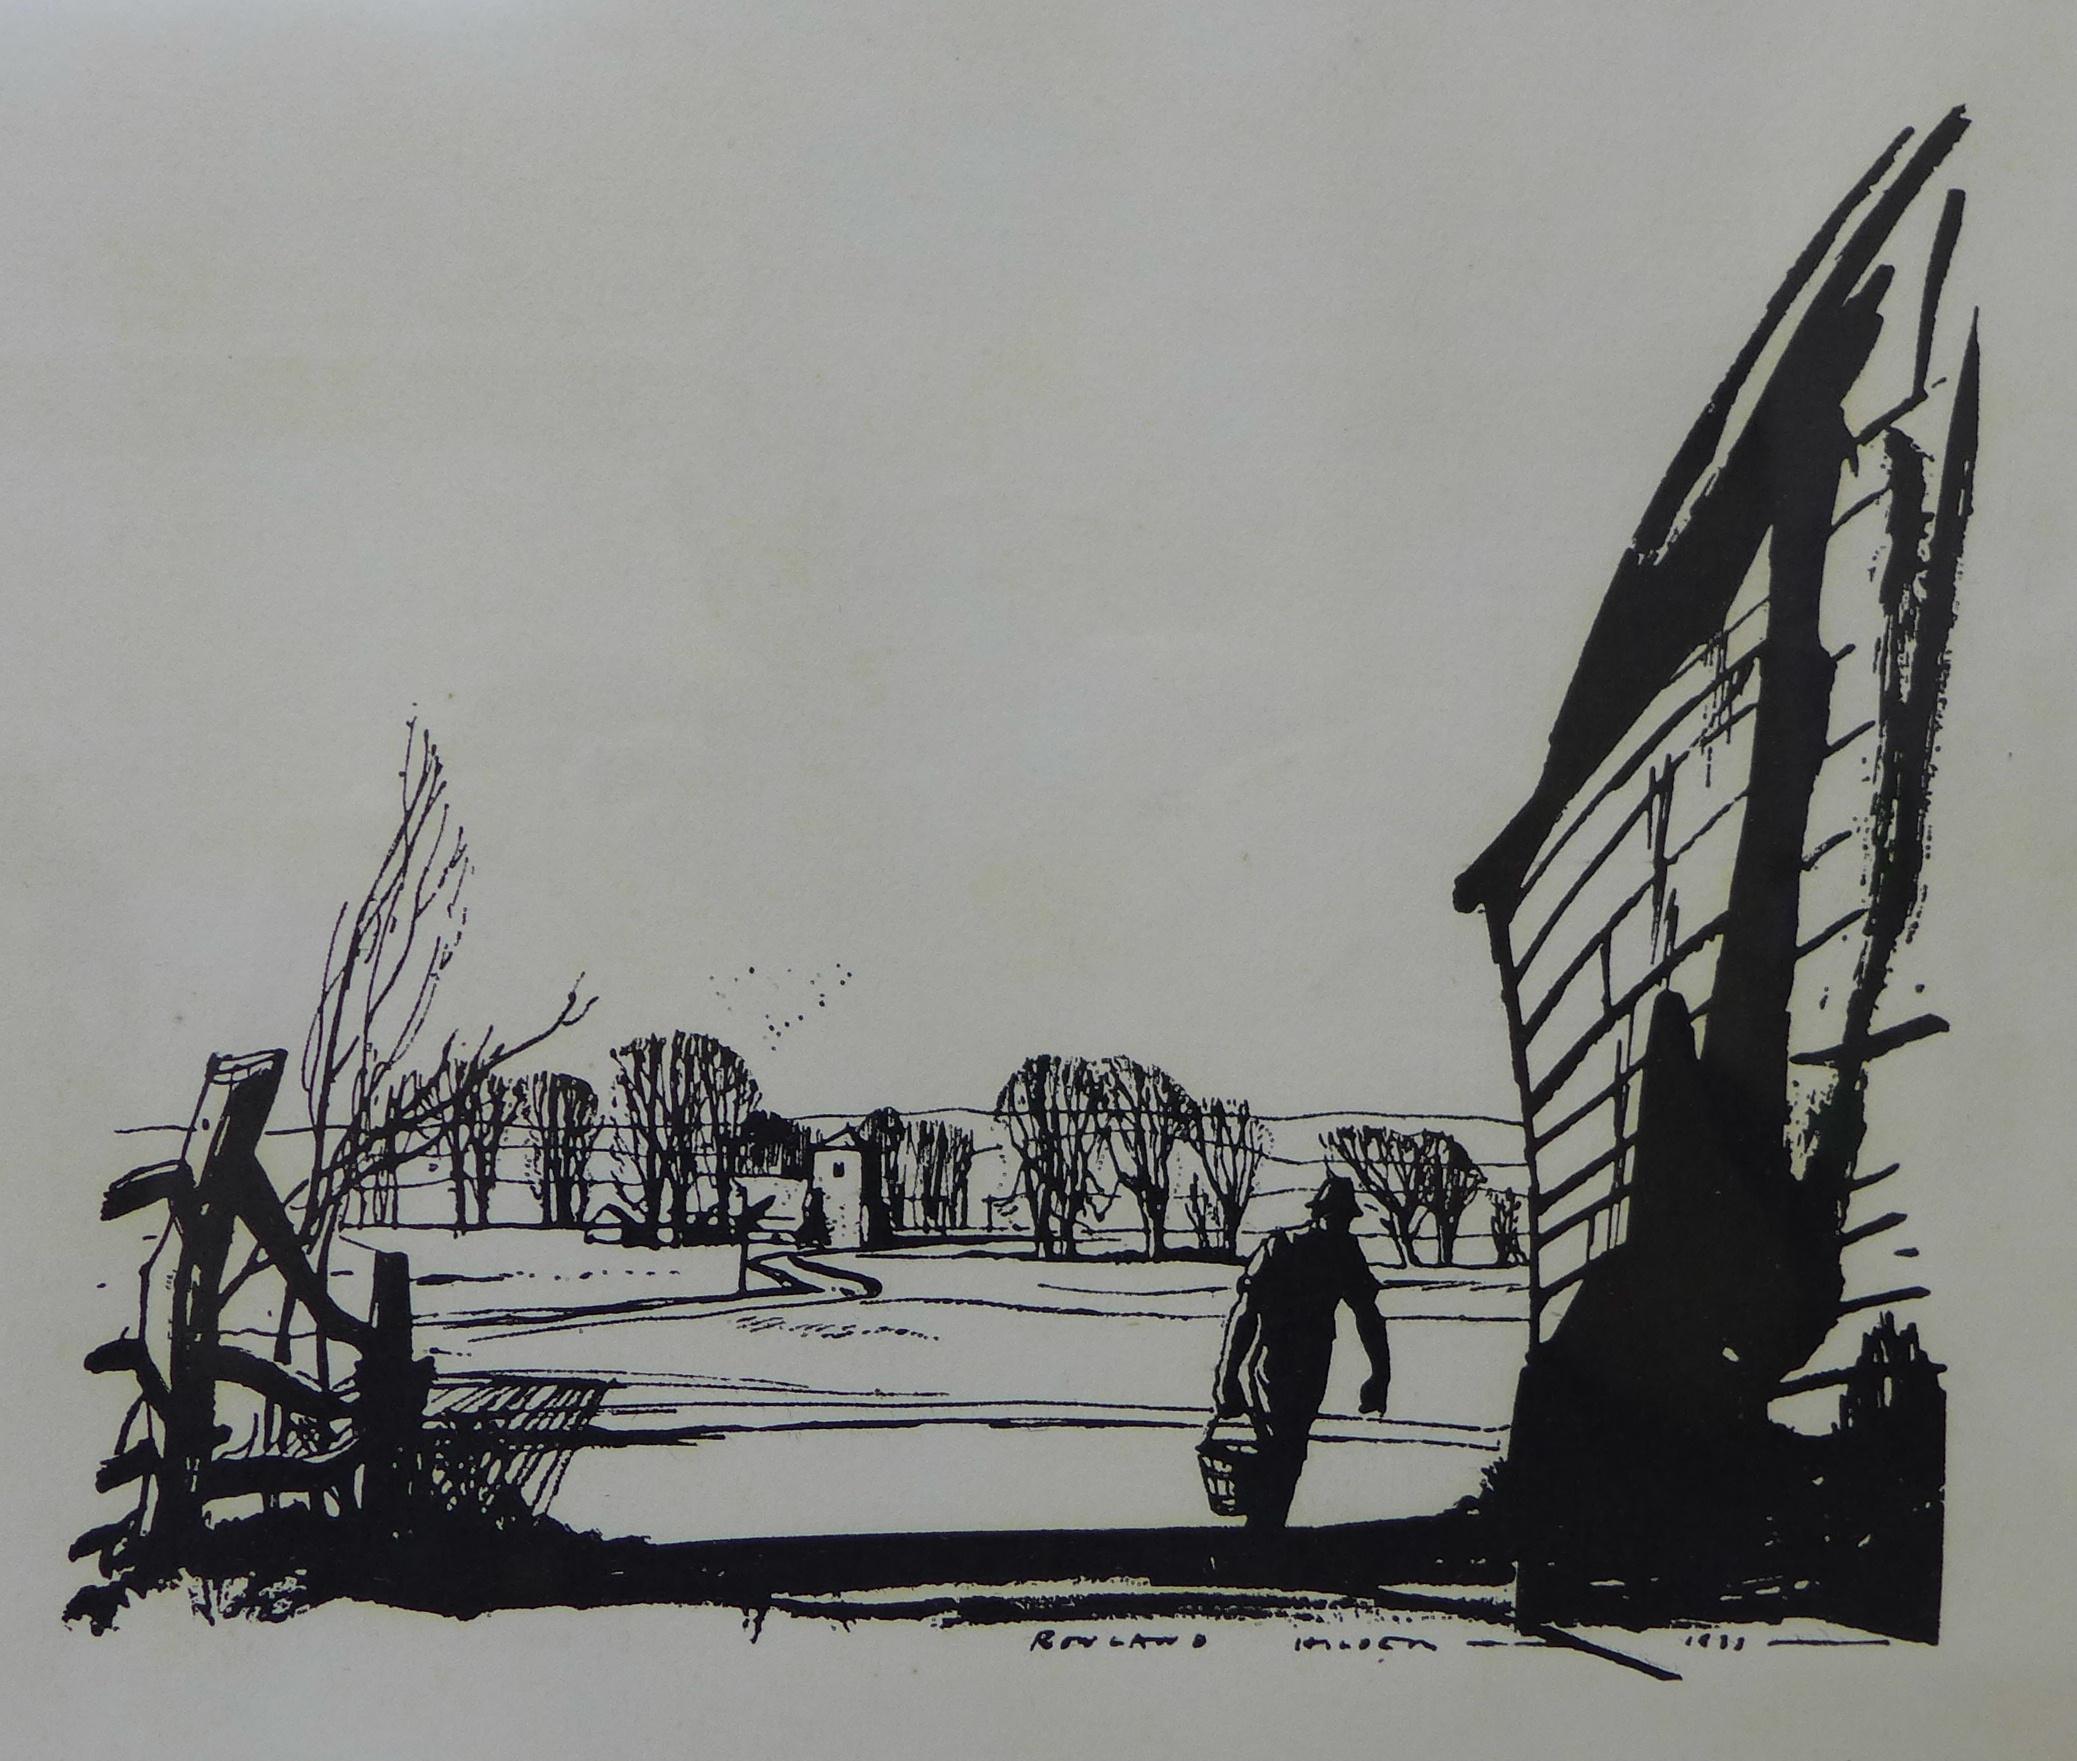 Lot 26 - Rowland Frederick Hilder OBE (1905 - 1993) , landscape, pen and ink, 26 x 28cms,